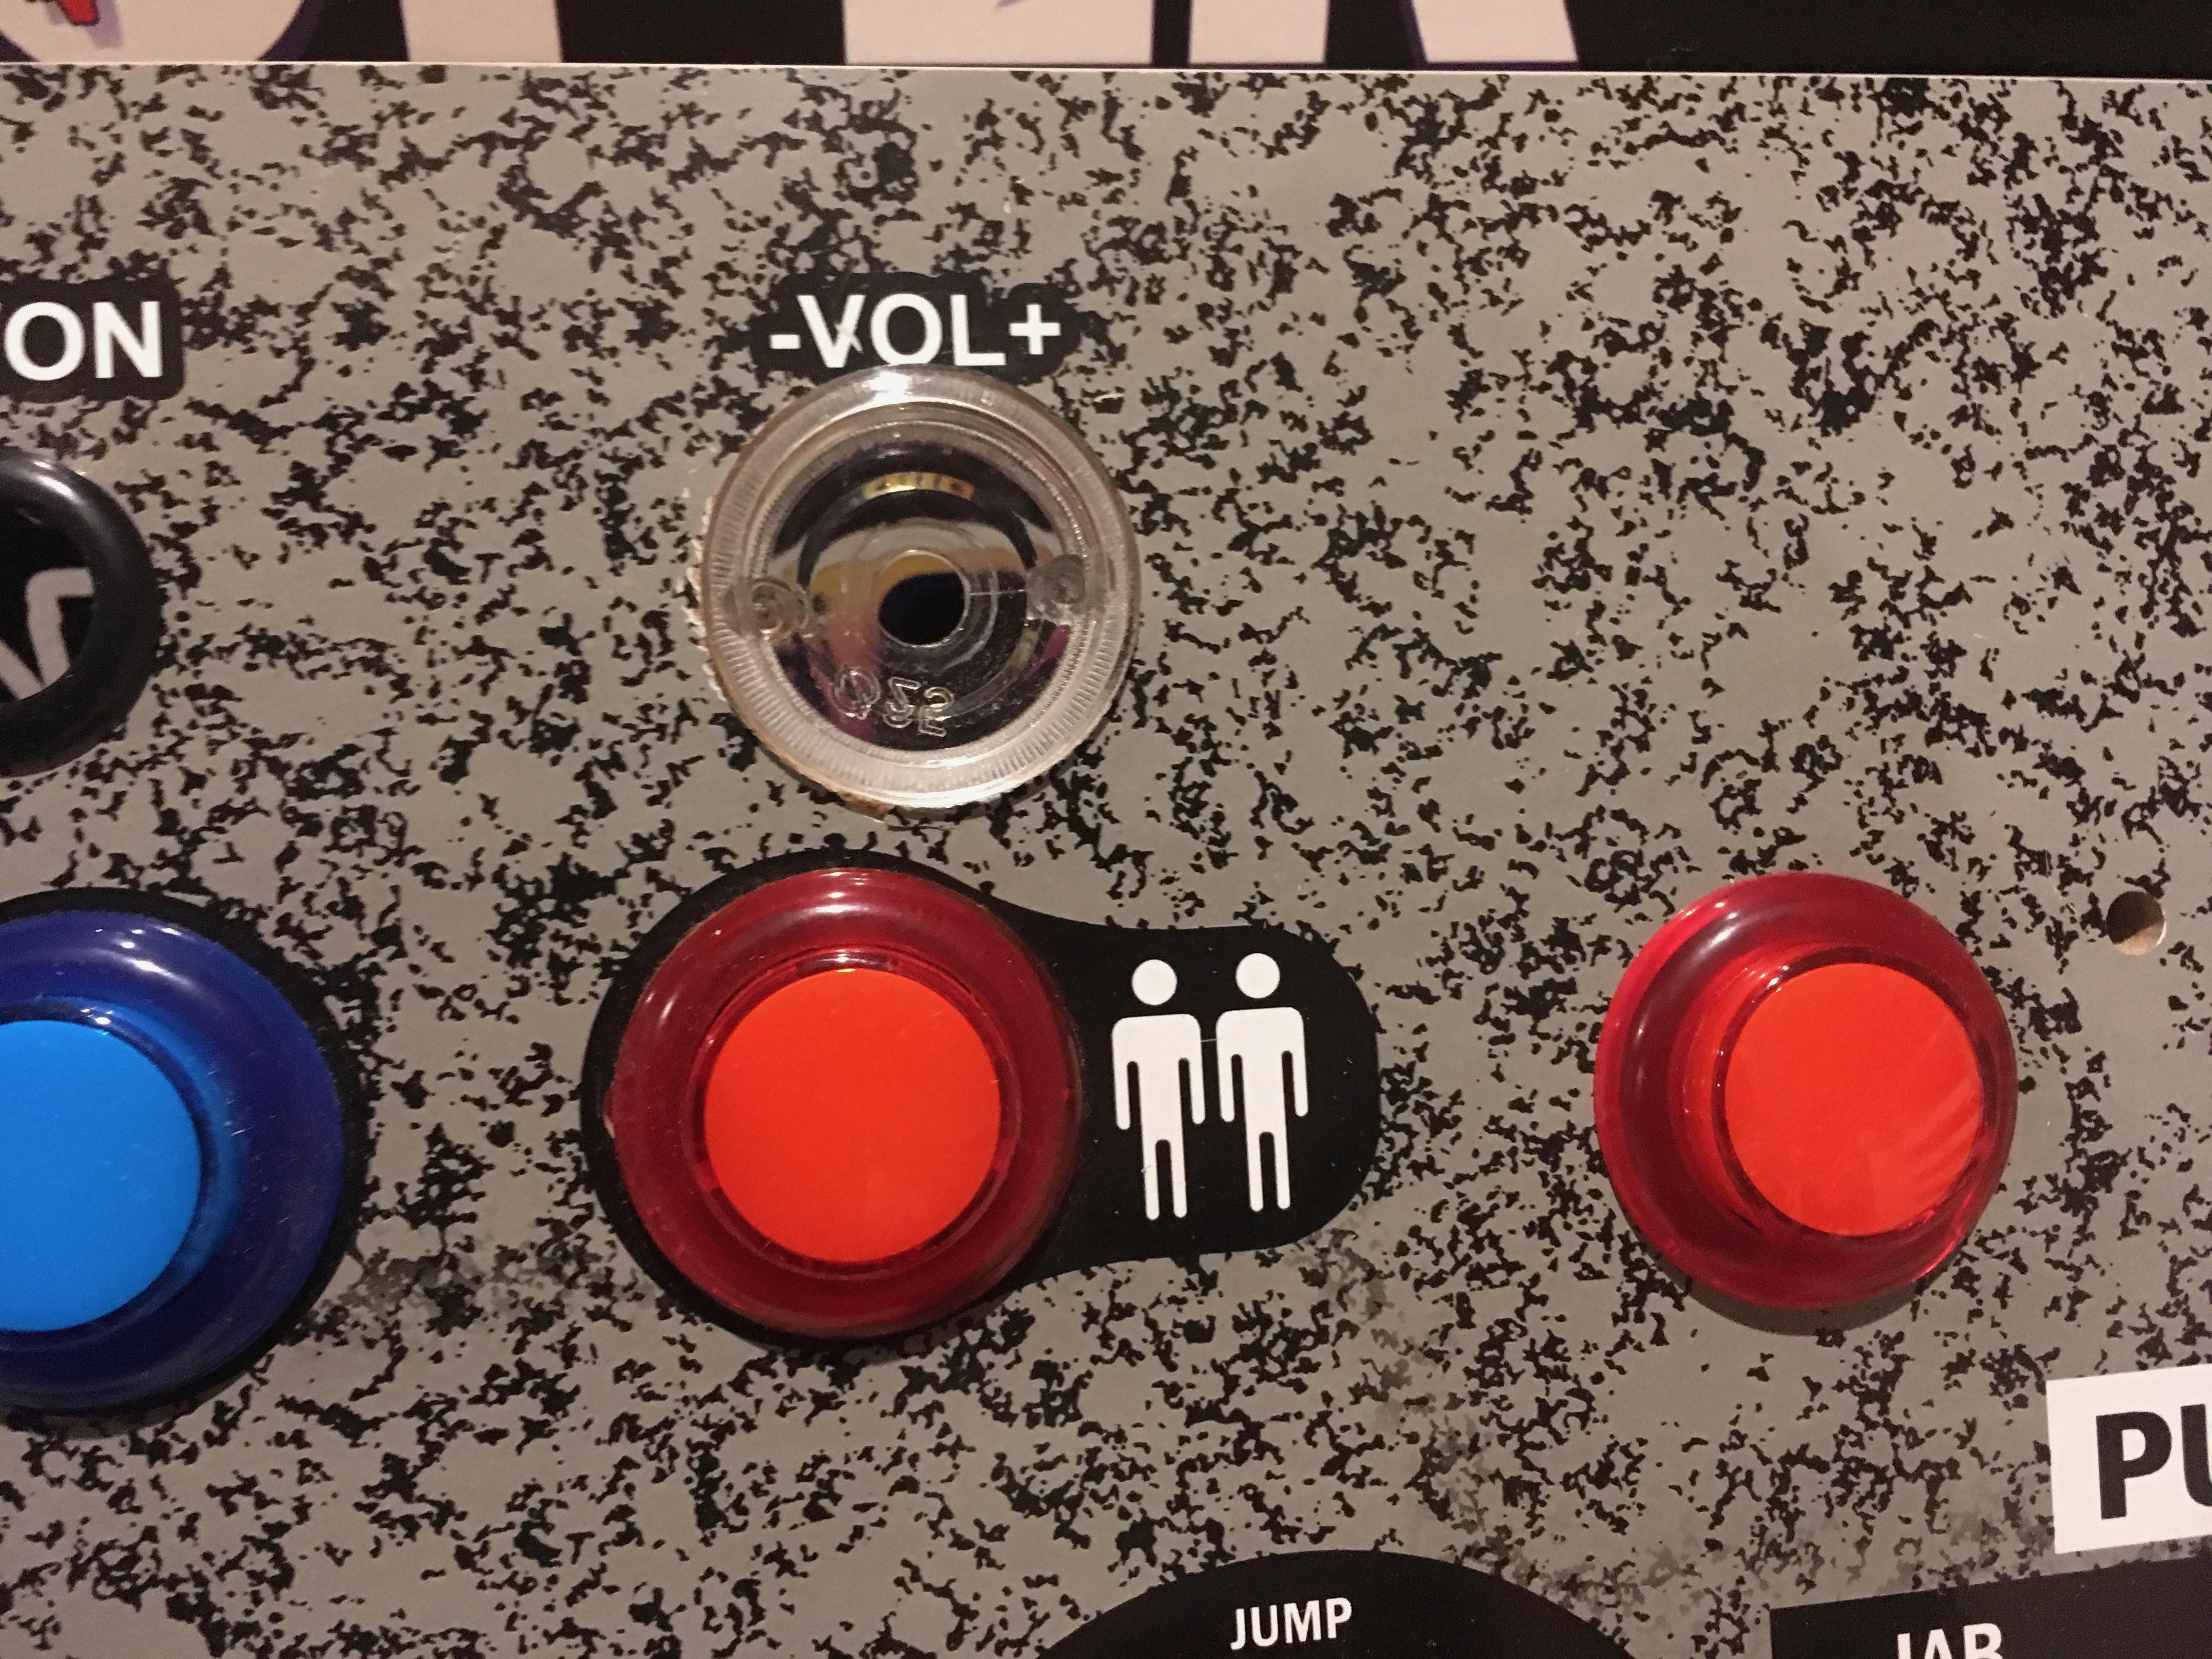 knob casing installed.